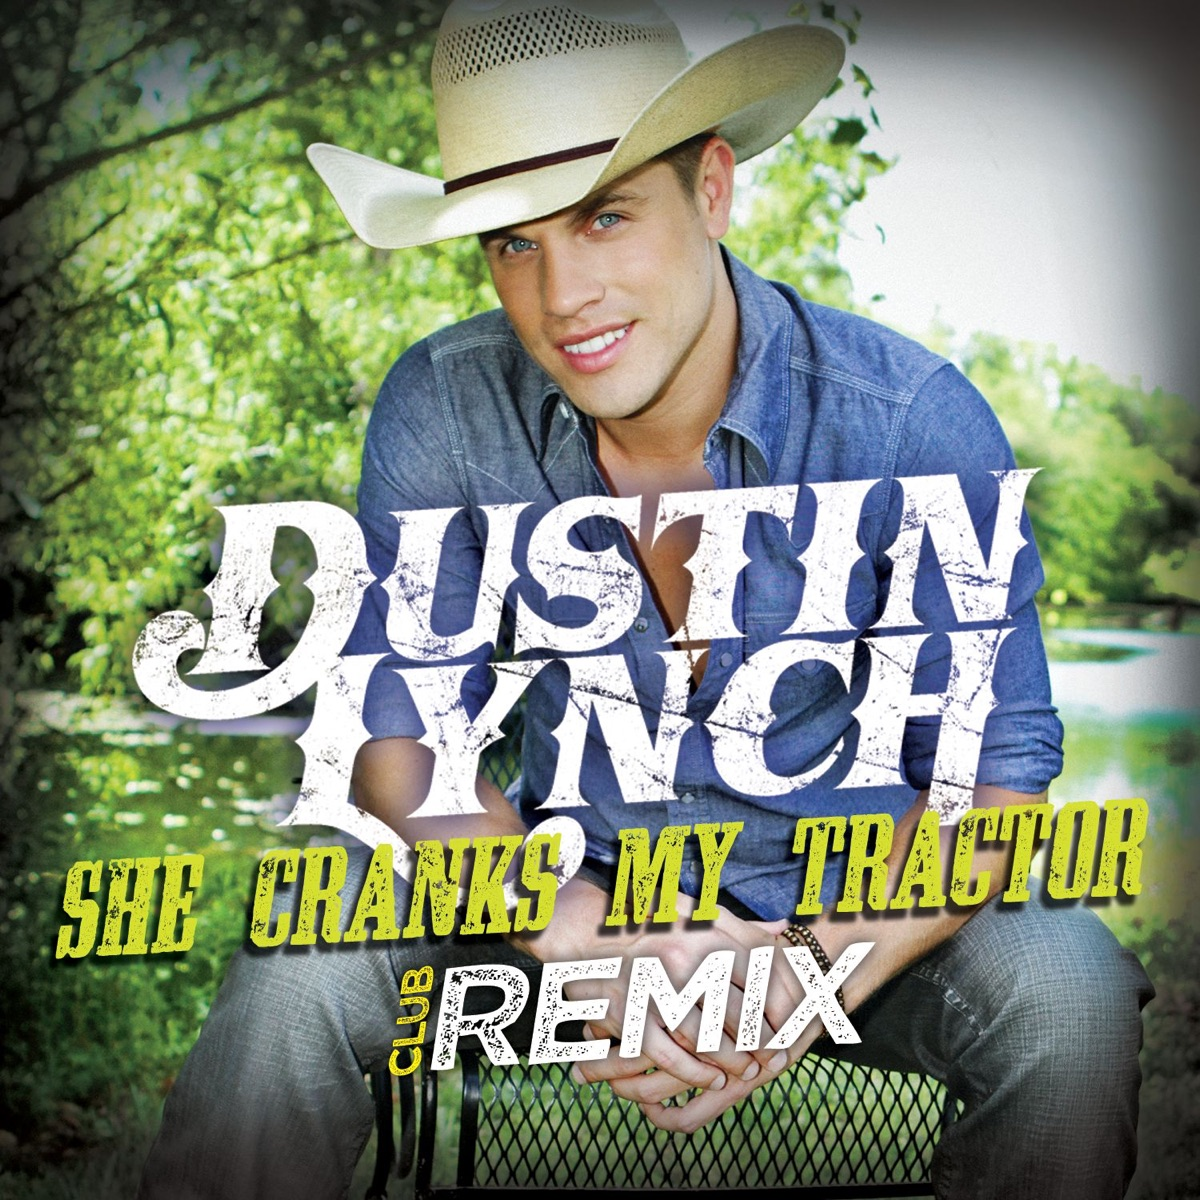 She Cranks My Tractor Club Remix - Single Dustin Lynch CD cover